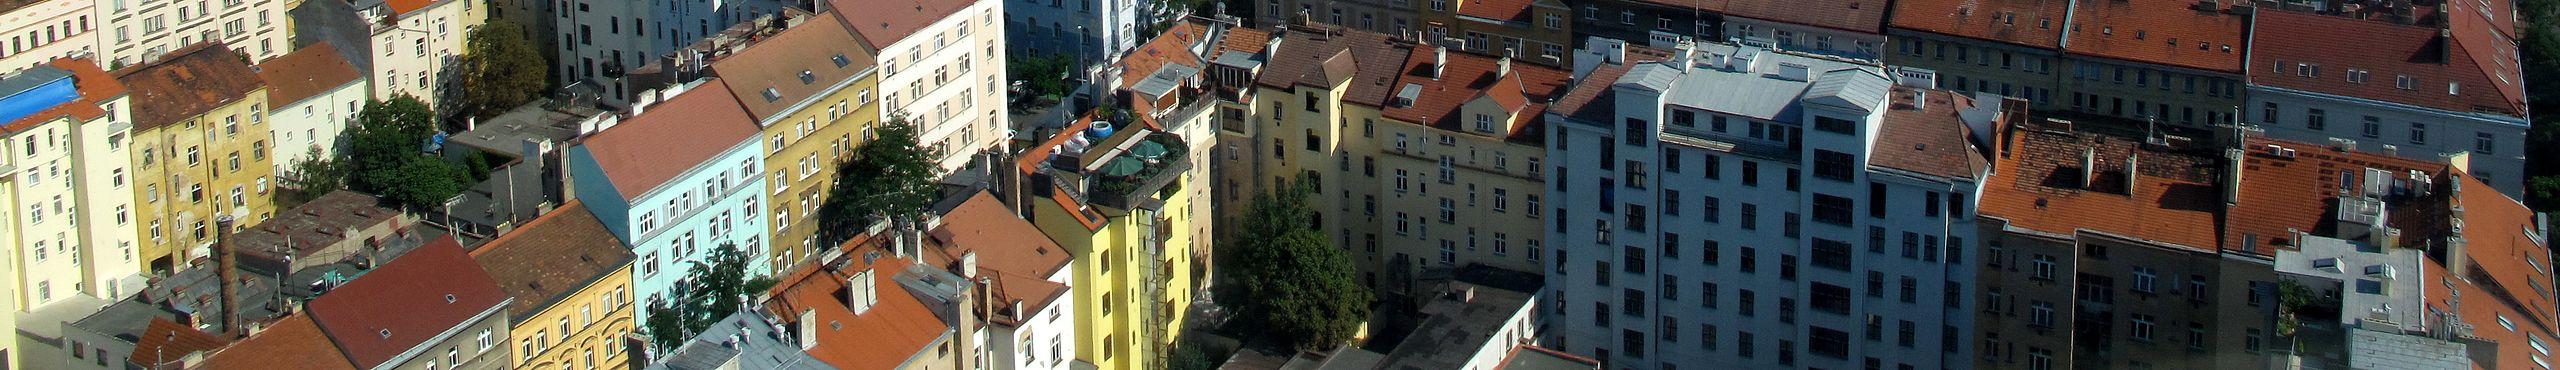 Prague/East bank of Vltava – Travel guide at Wikivoyage